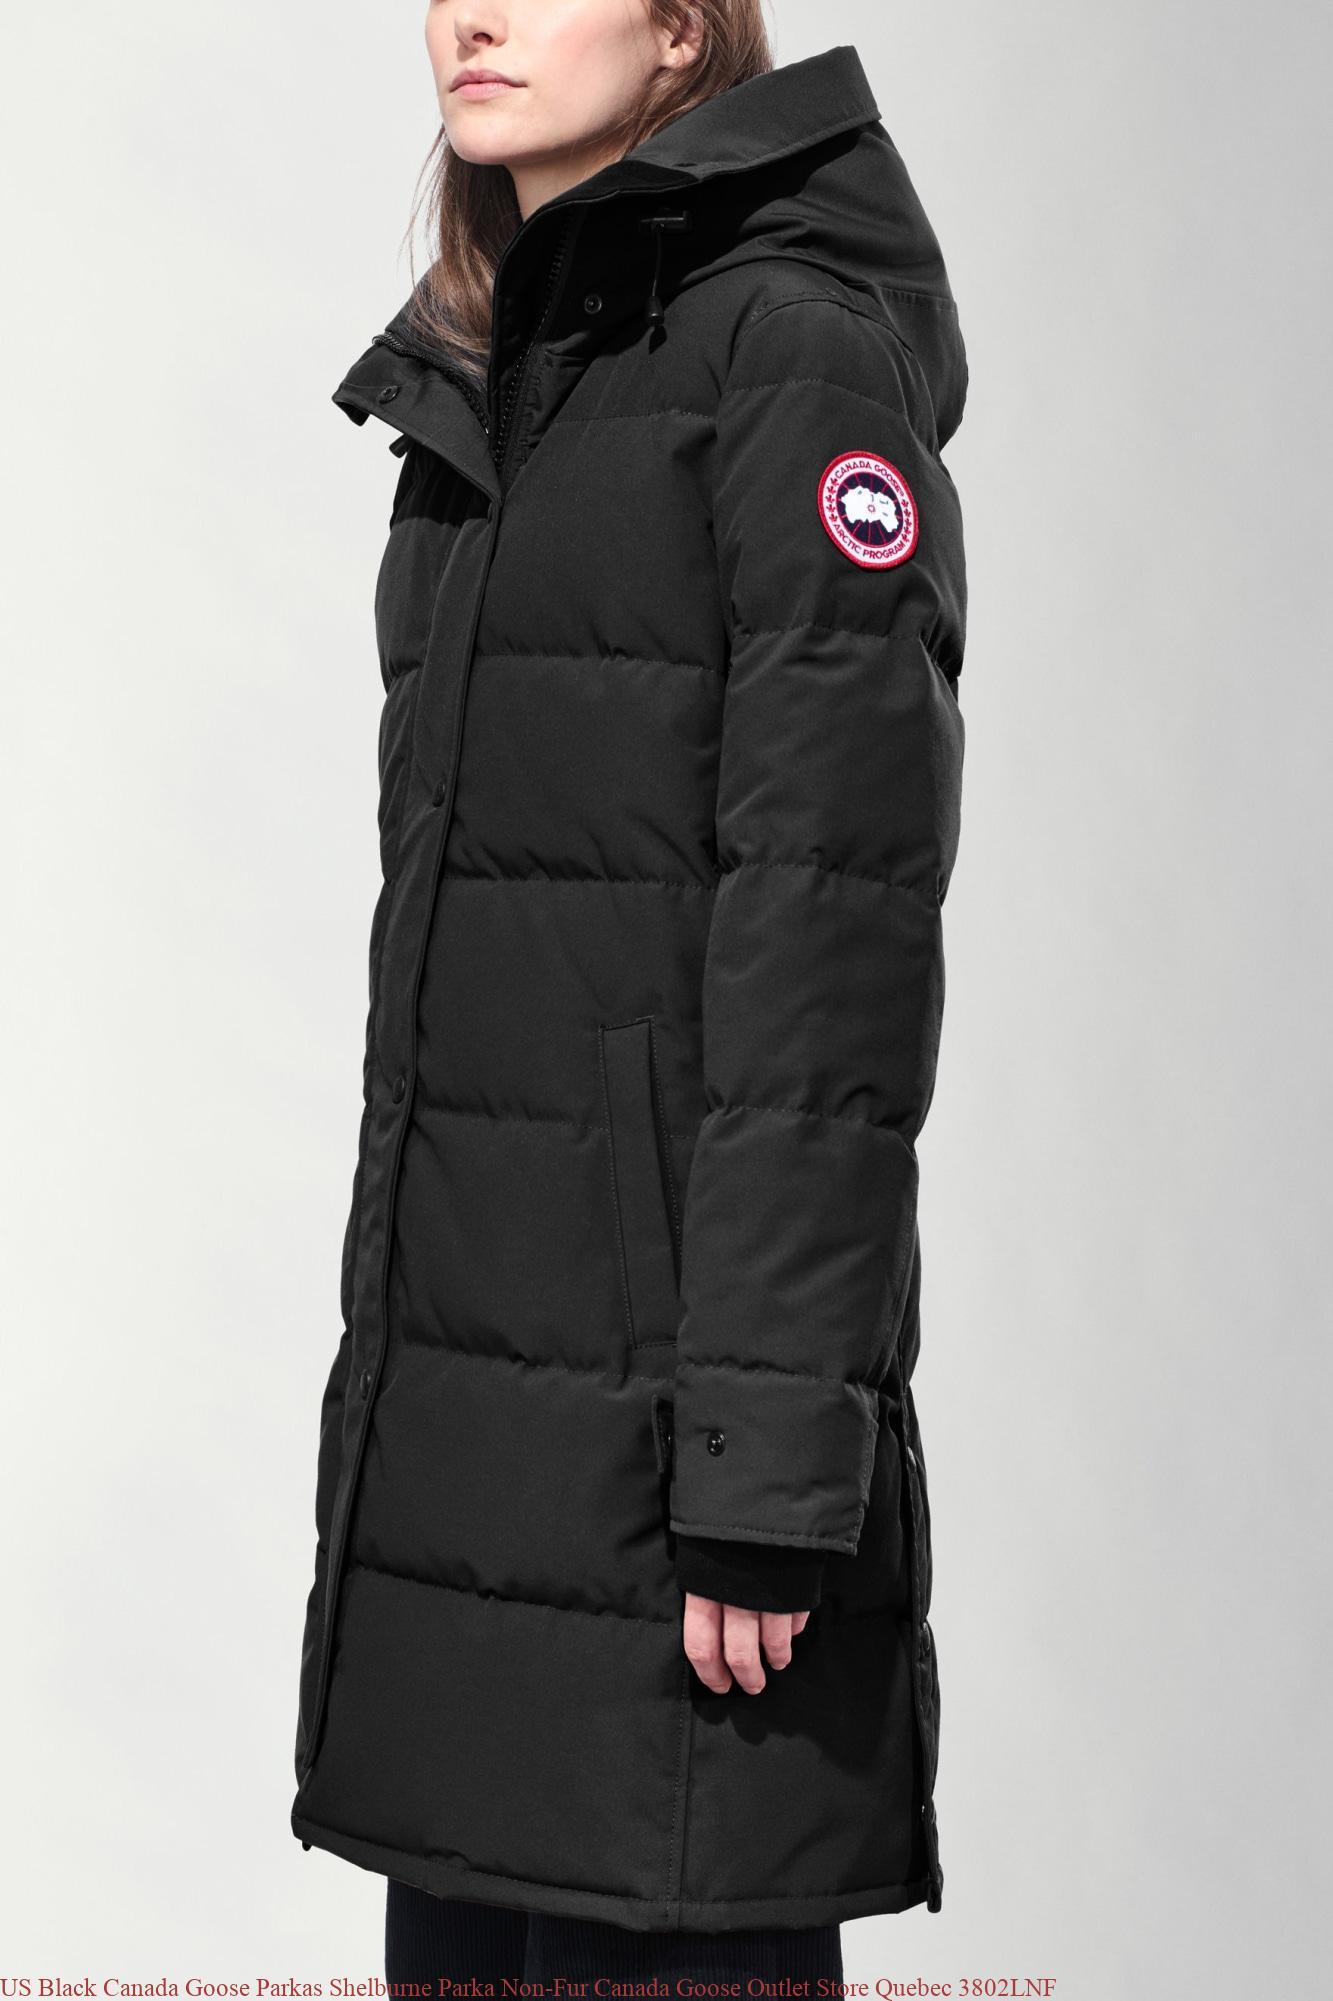 US Black Canada Goose Parkas Shelburne Parka Non Fur Canada Goose Outlet Store Quebec 3802LNF